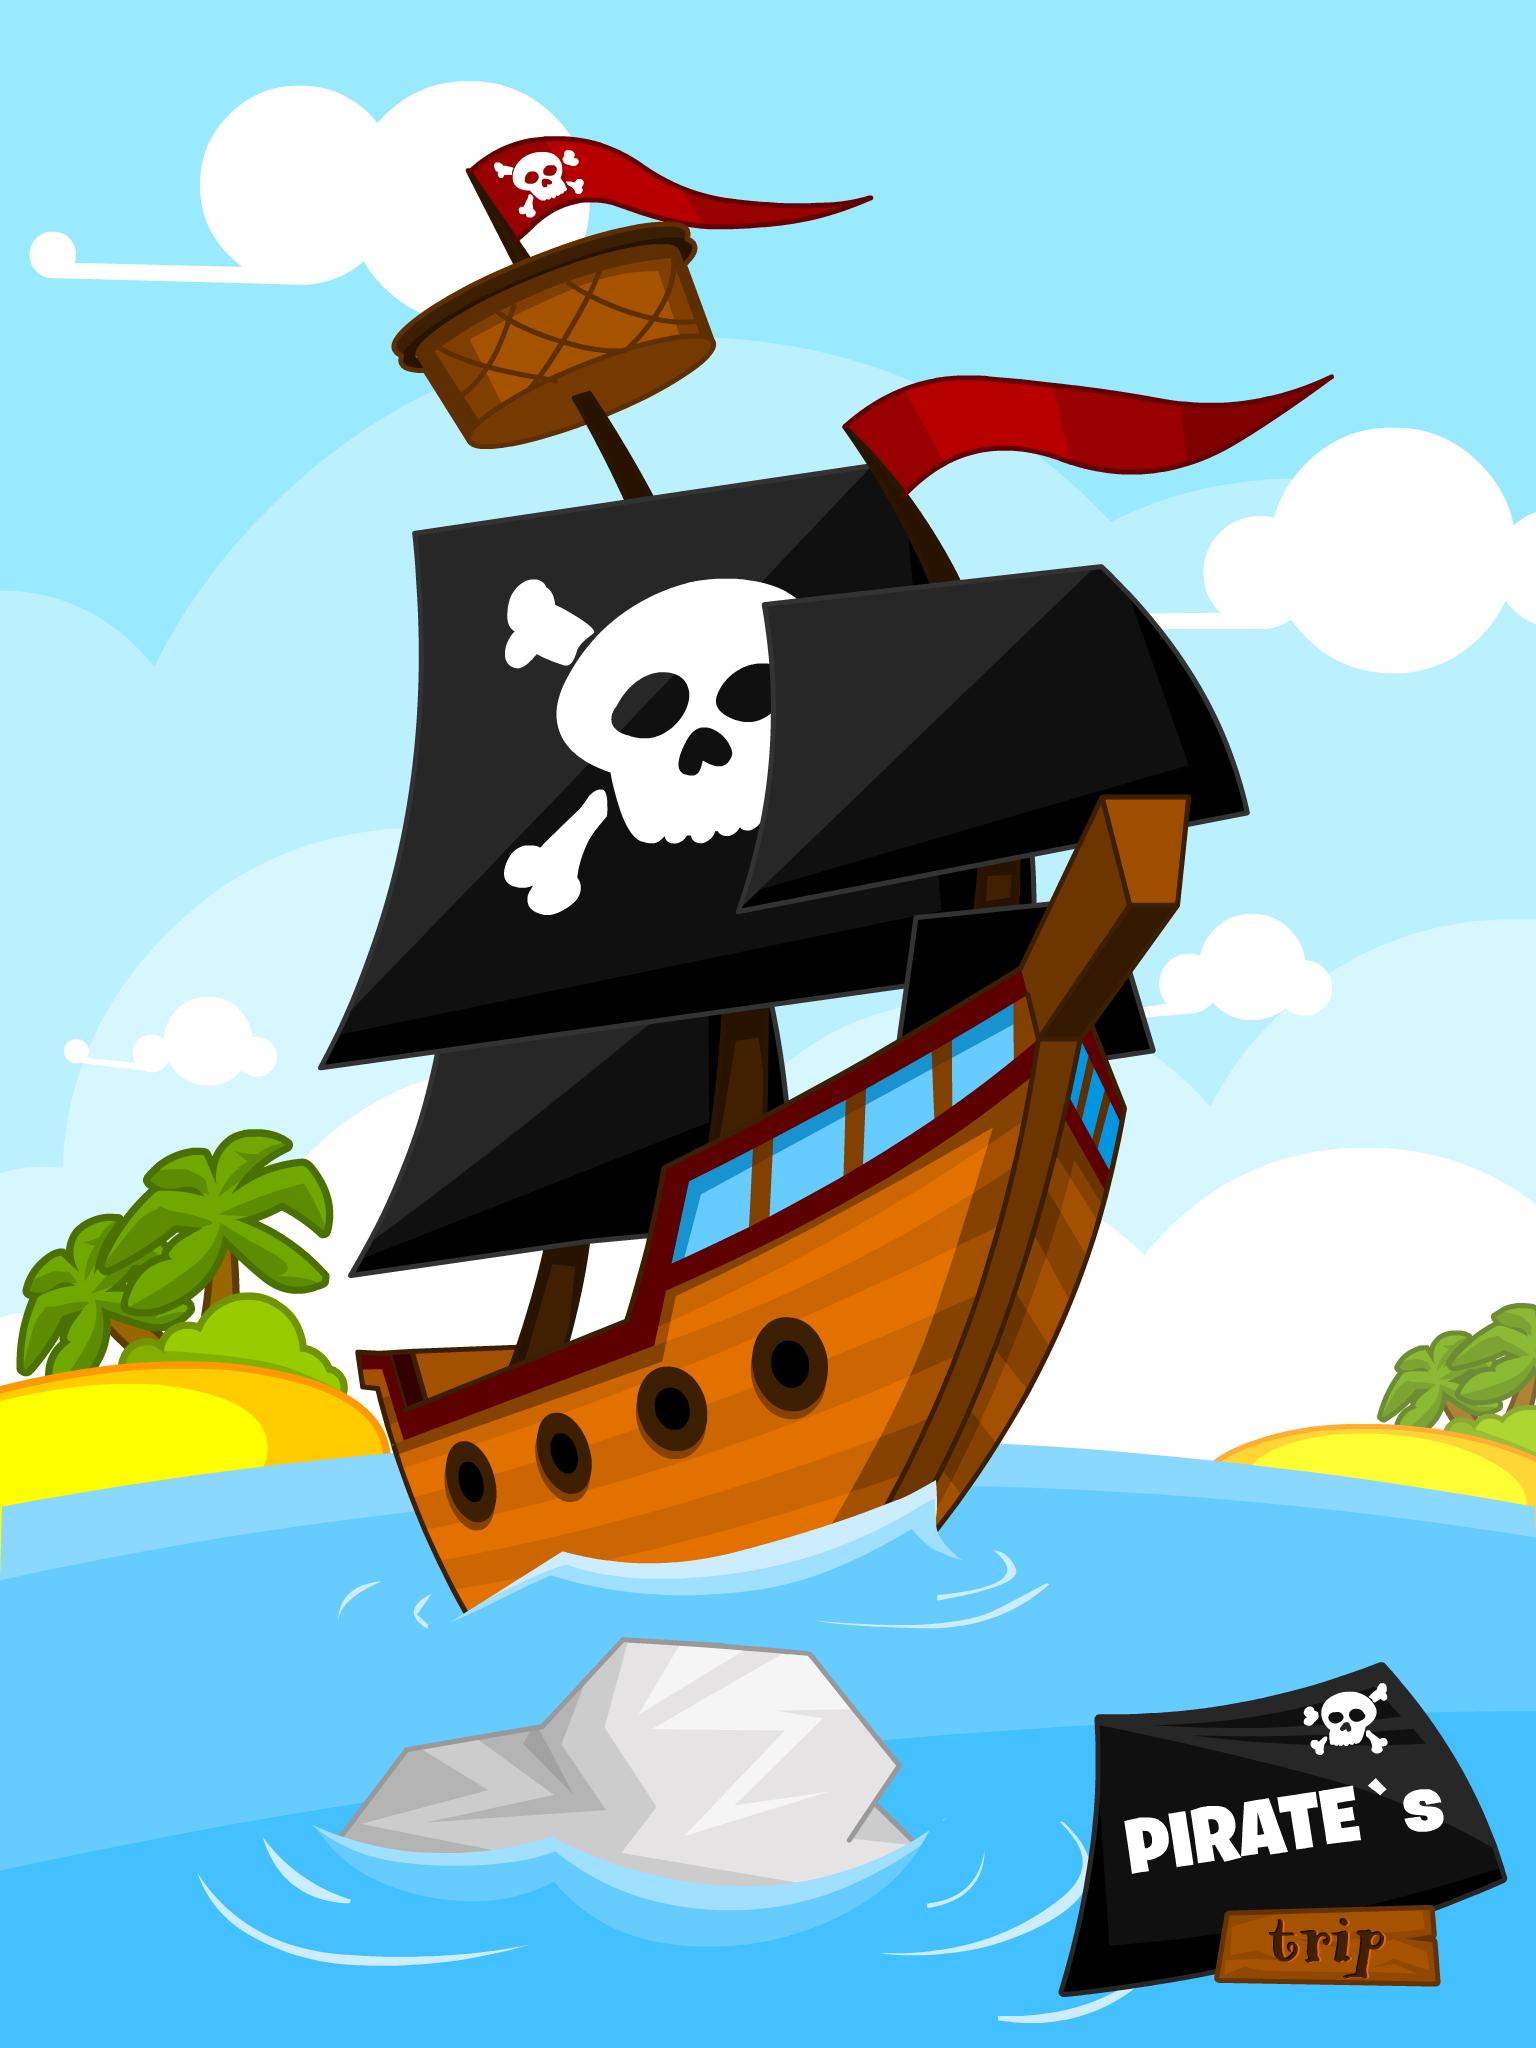 pirates_trip_splash_screen